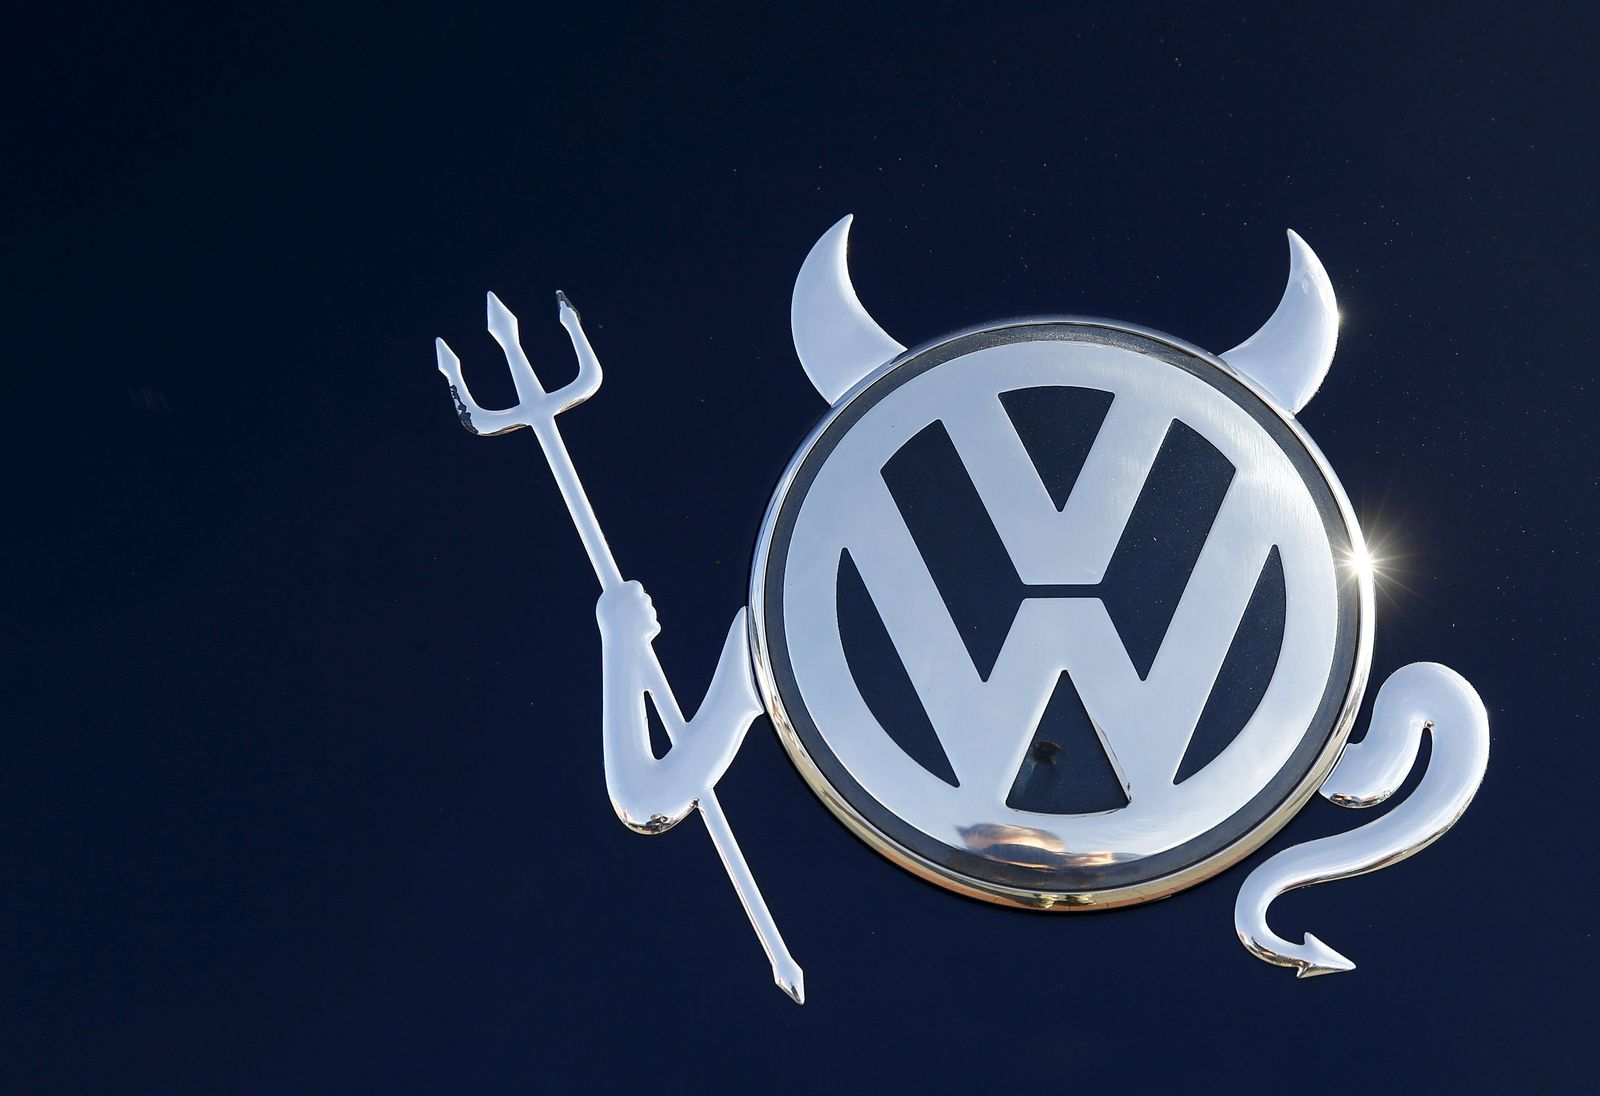 VW / Teufel